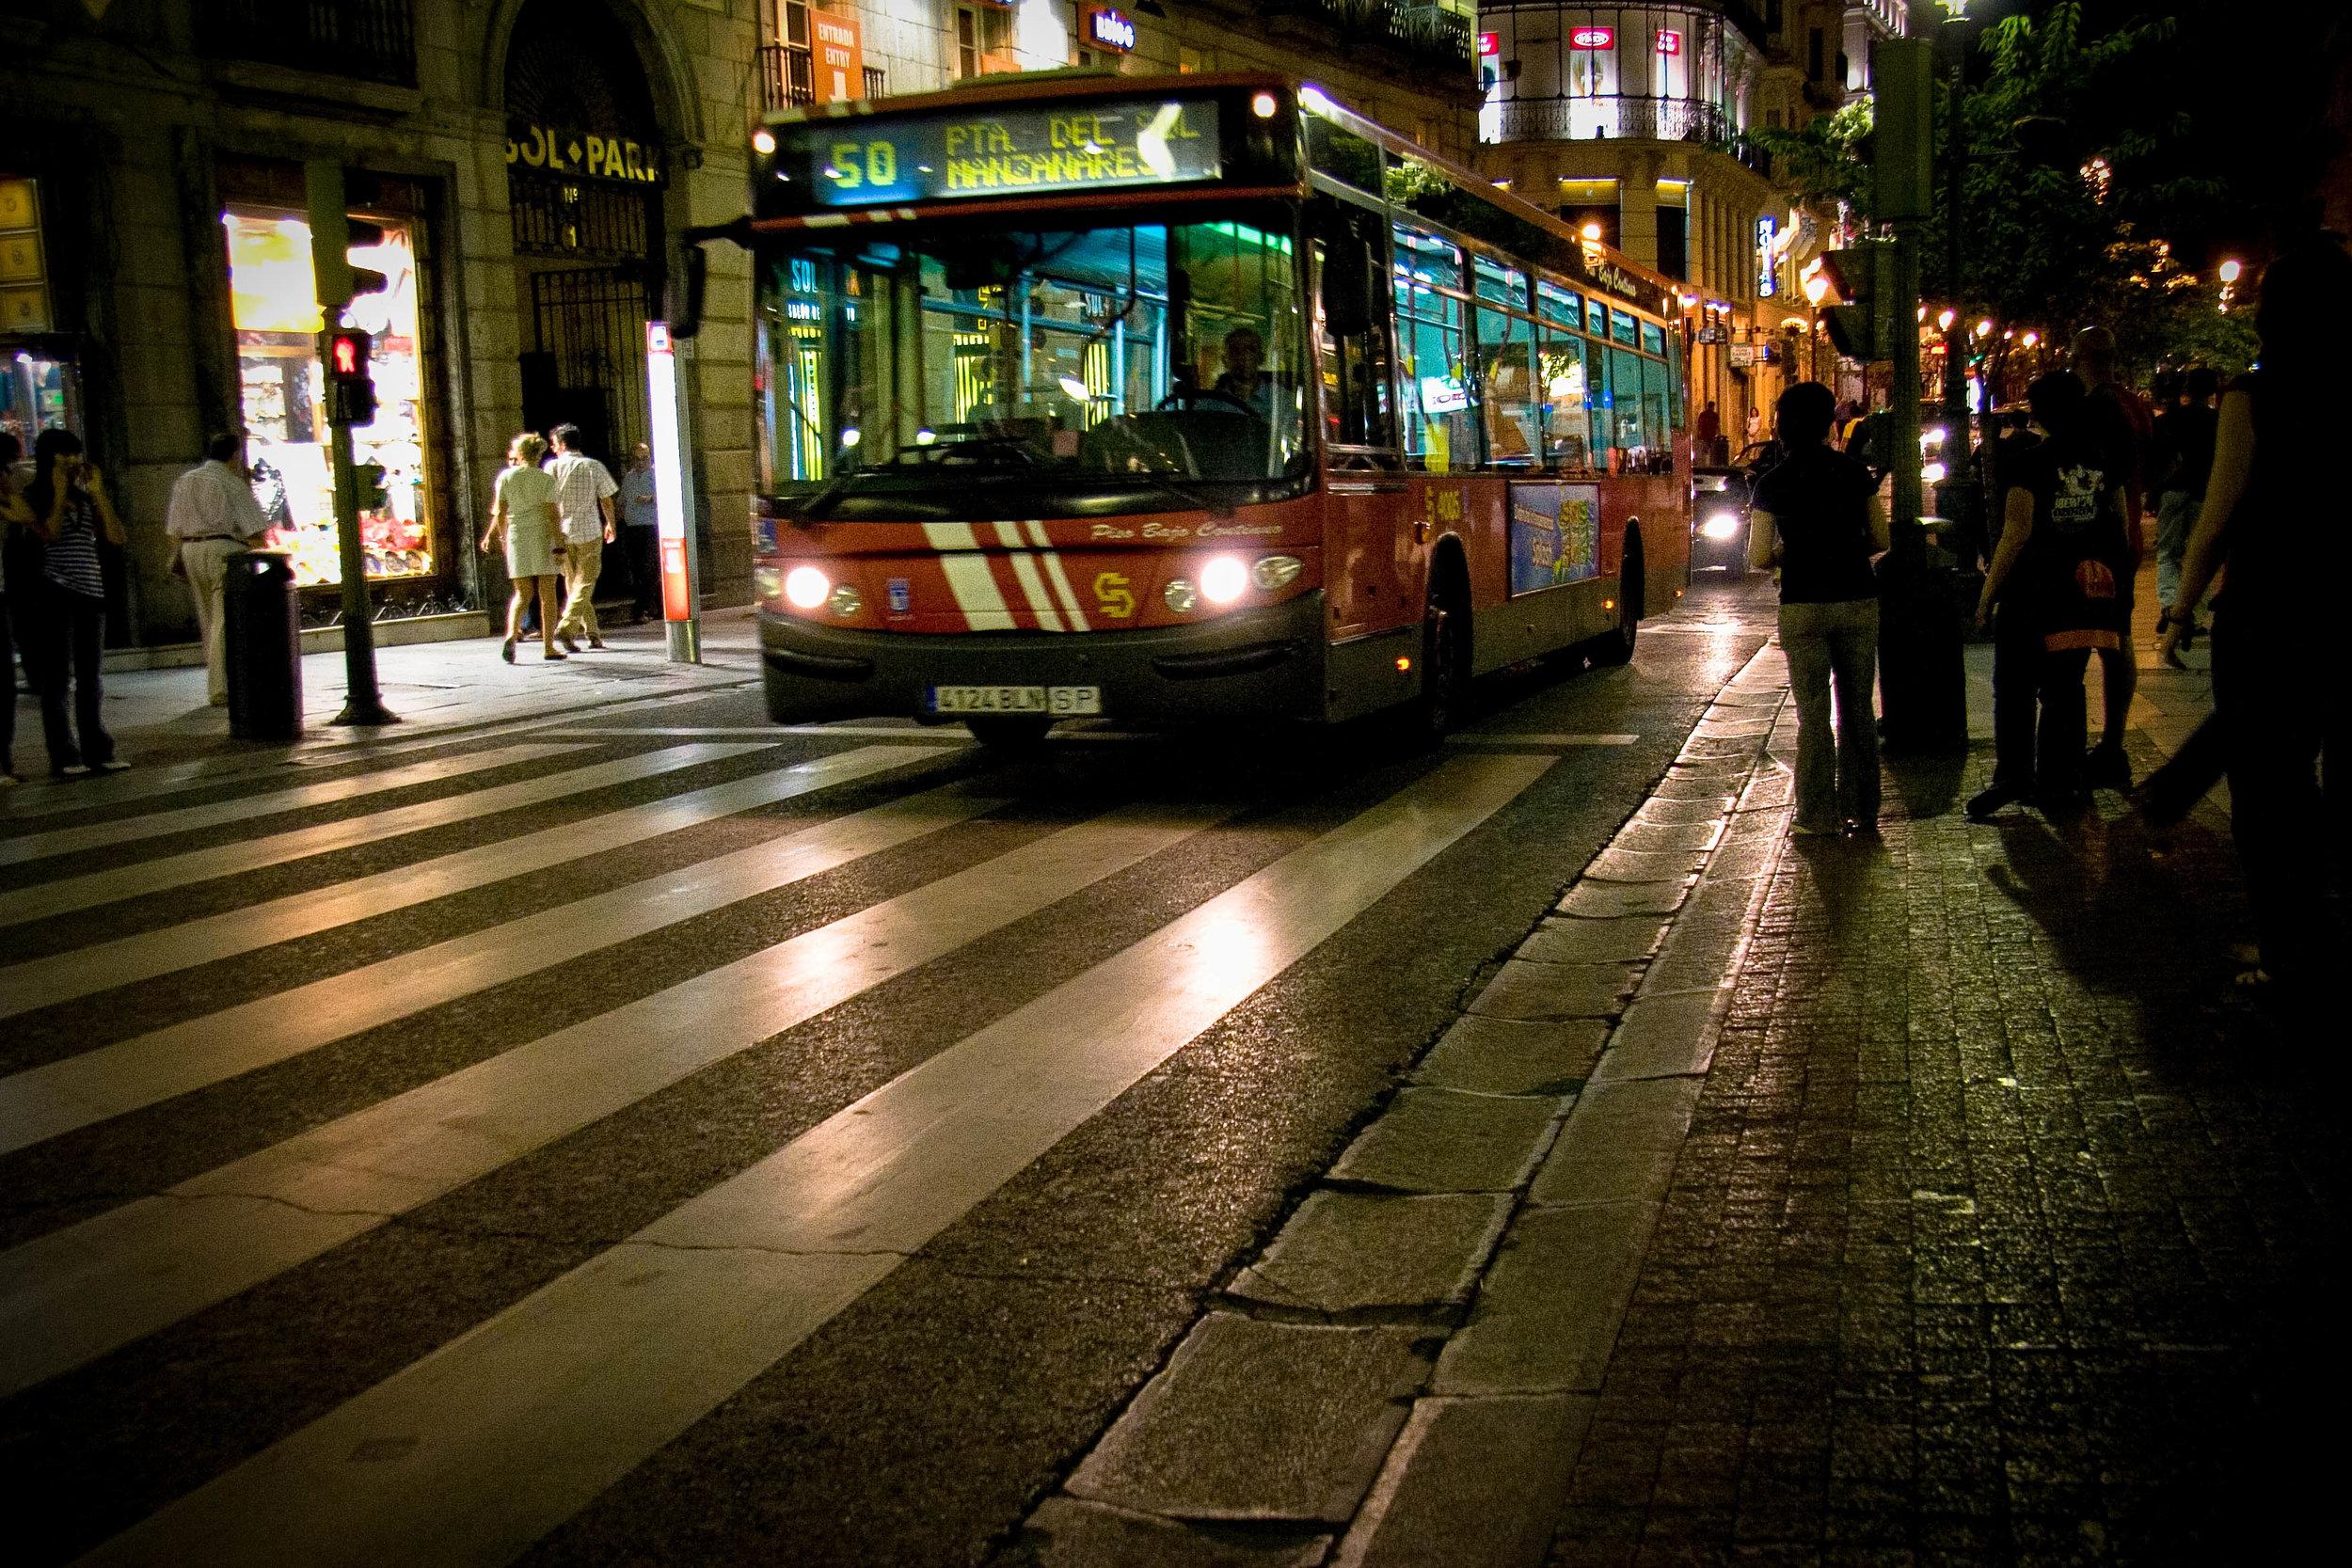 Night Bus. Puerta del Sol. Madrid